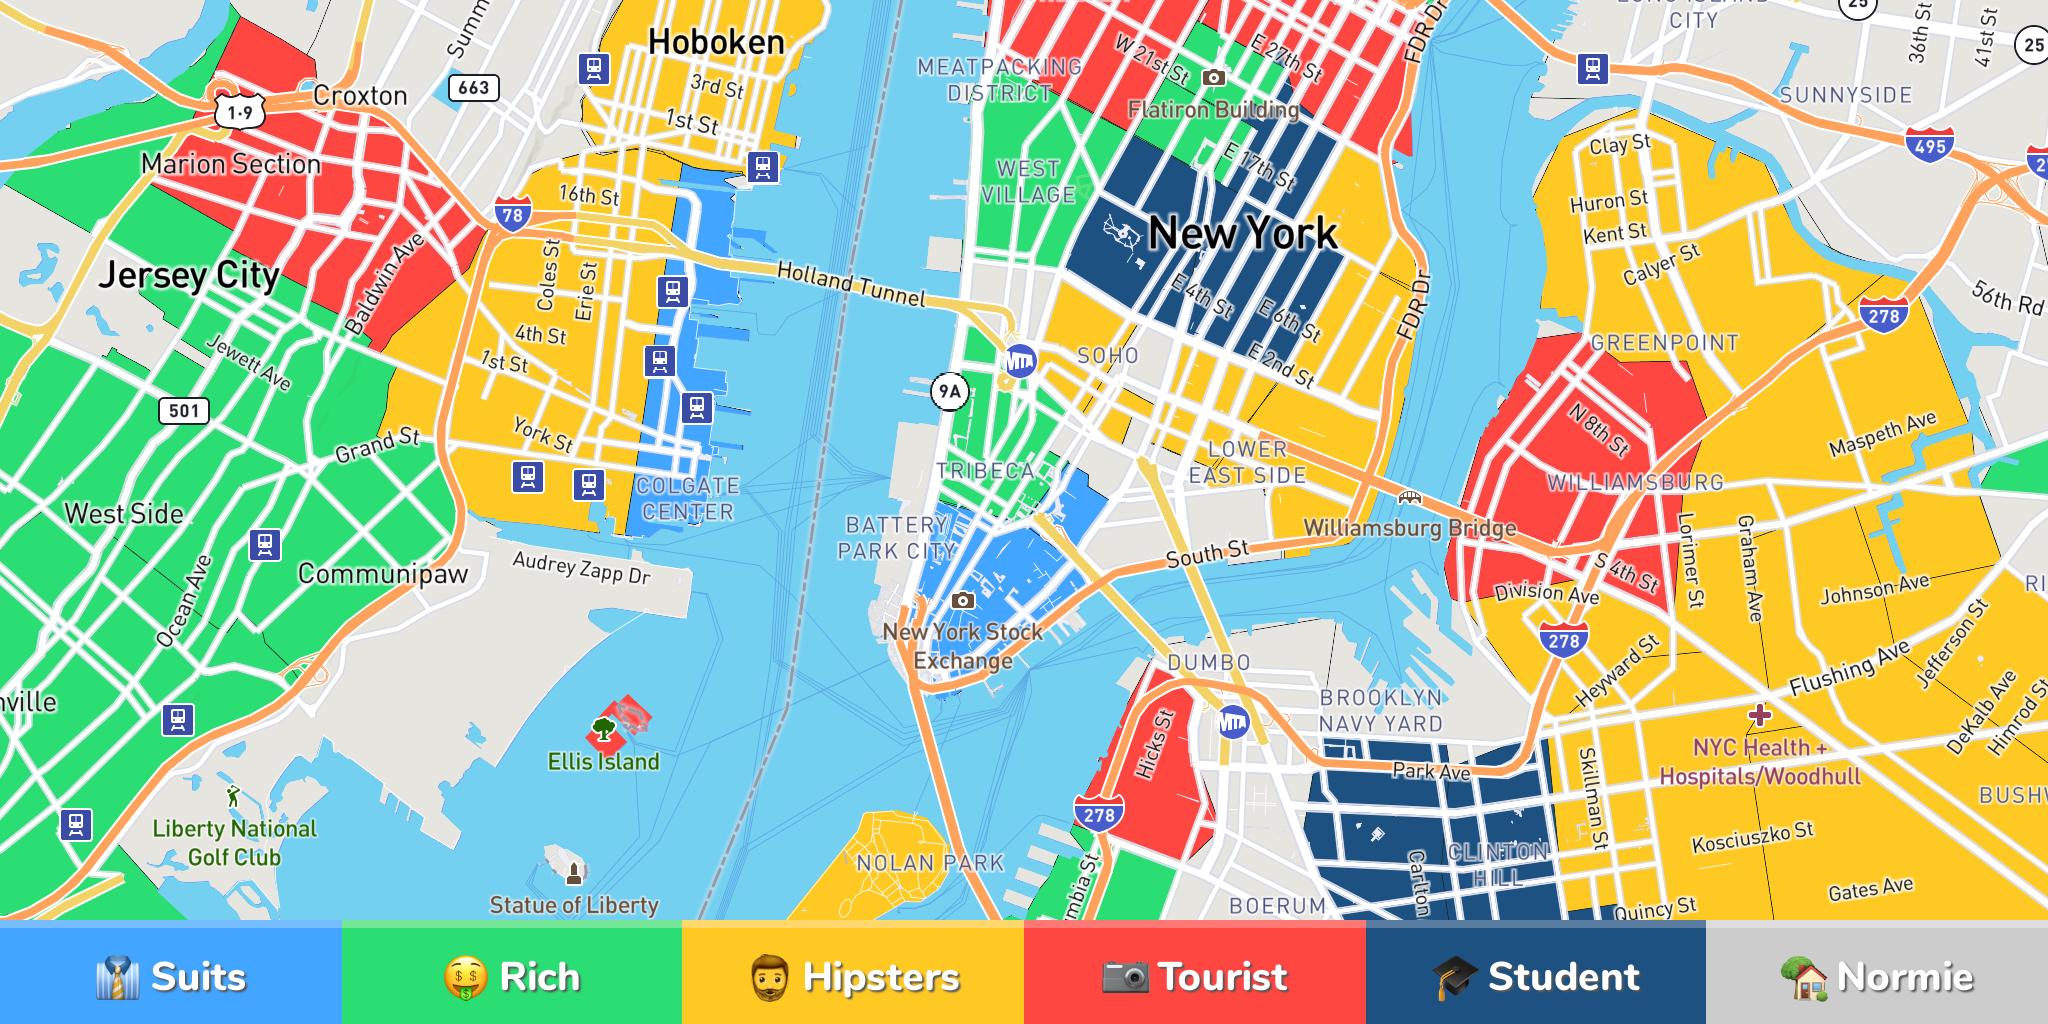 Where to Stay Around the World: Neighborhood Maps by Hoodmaps